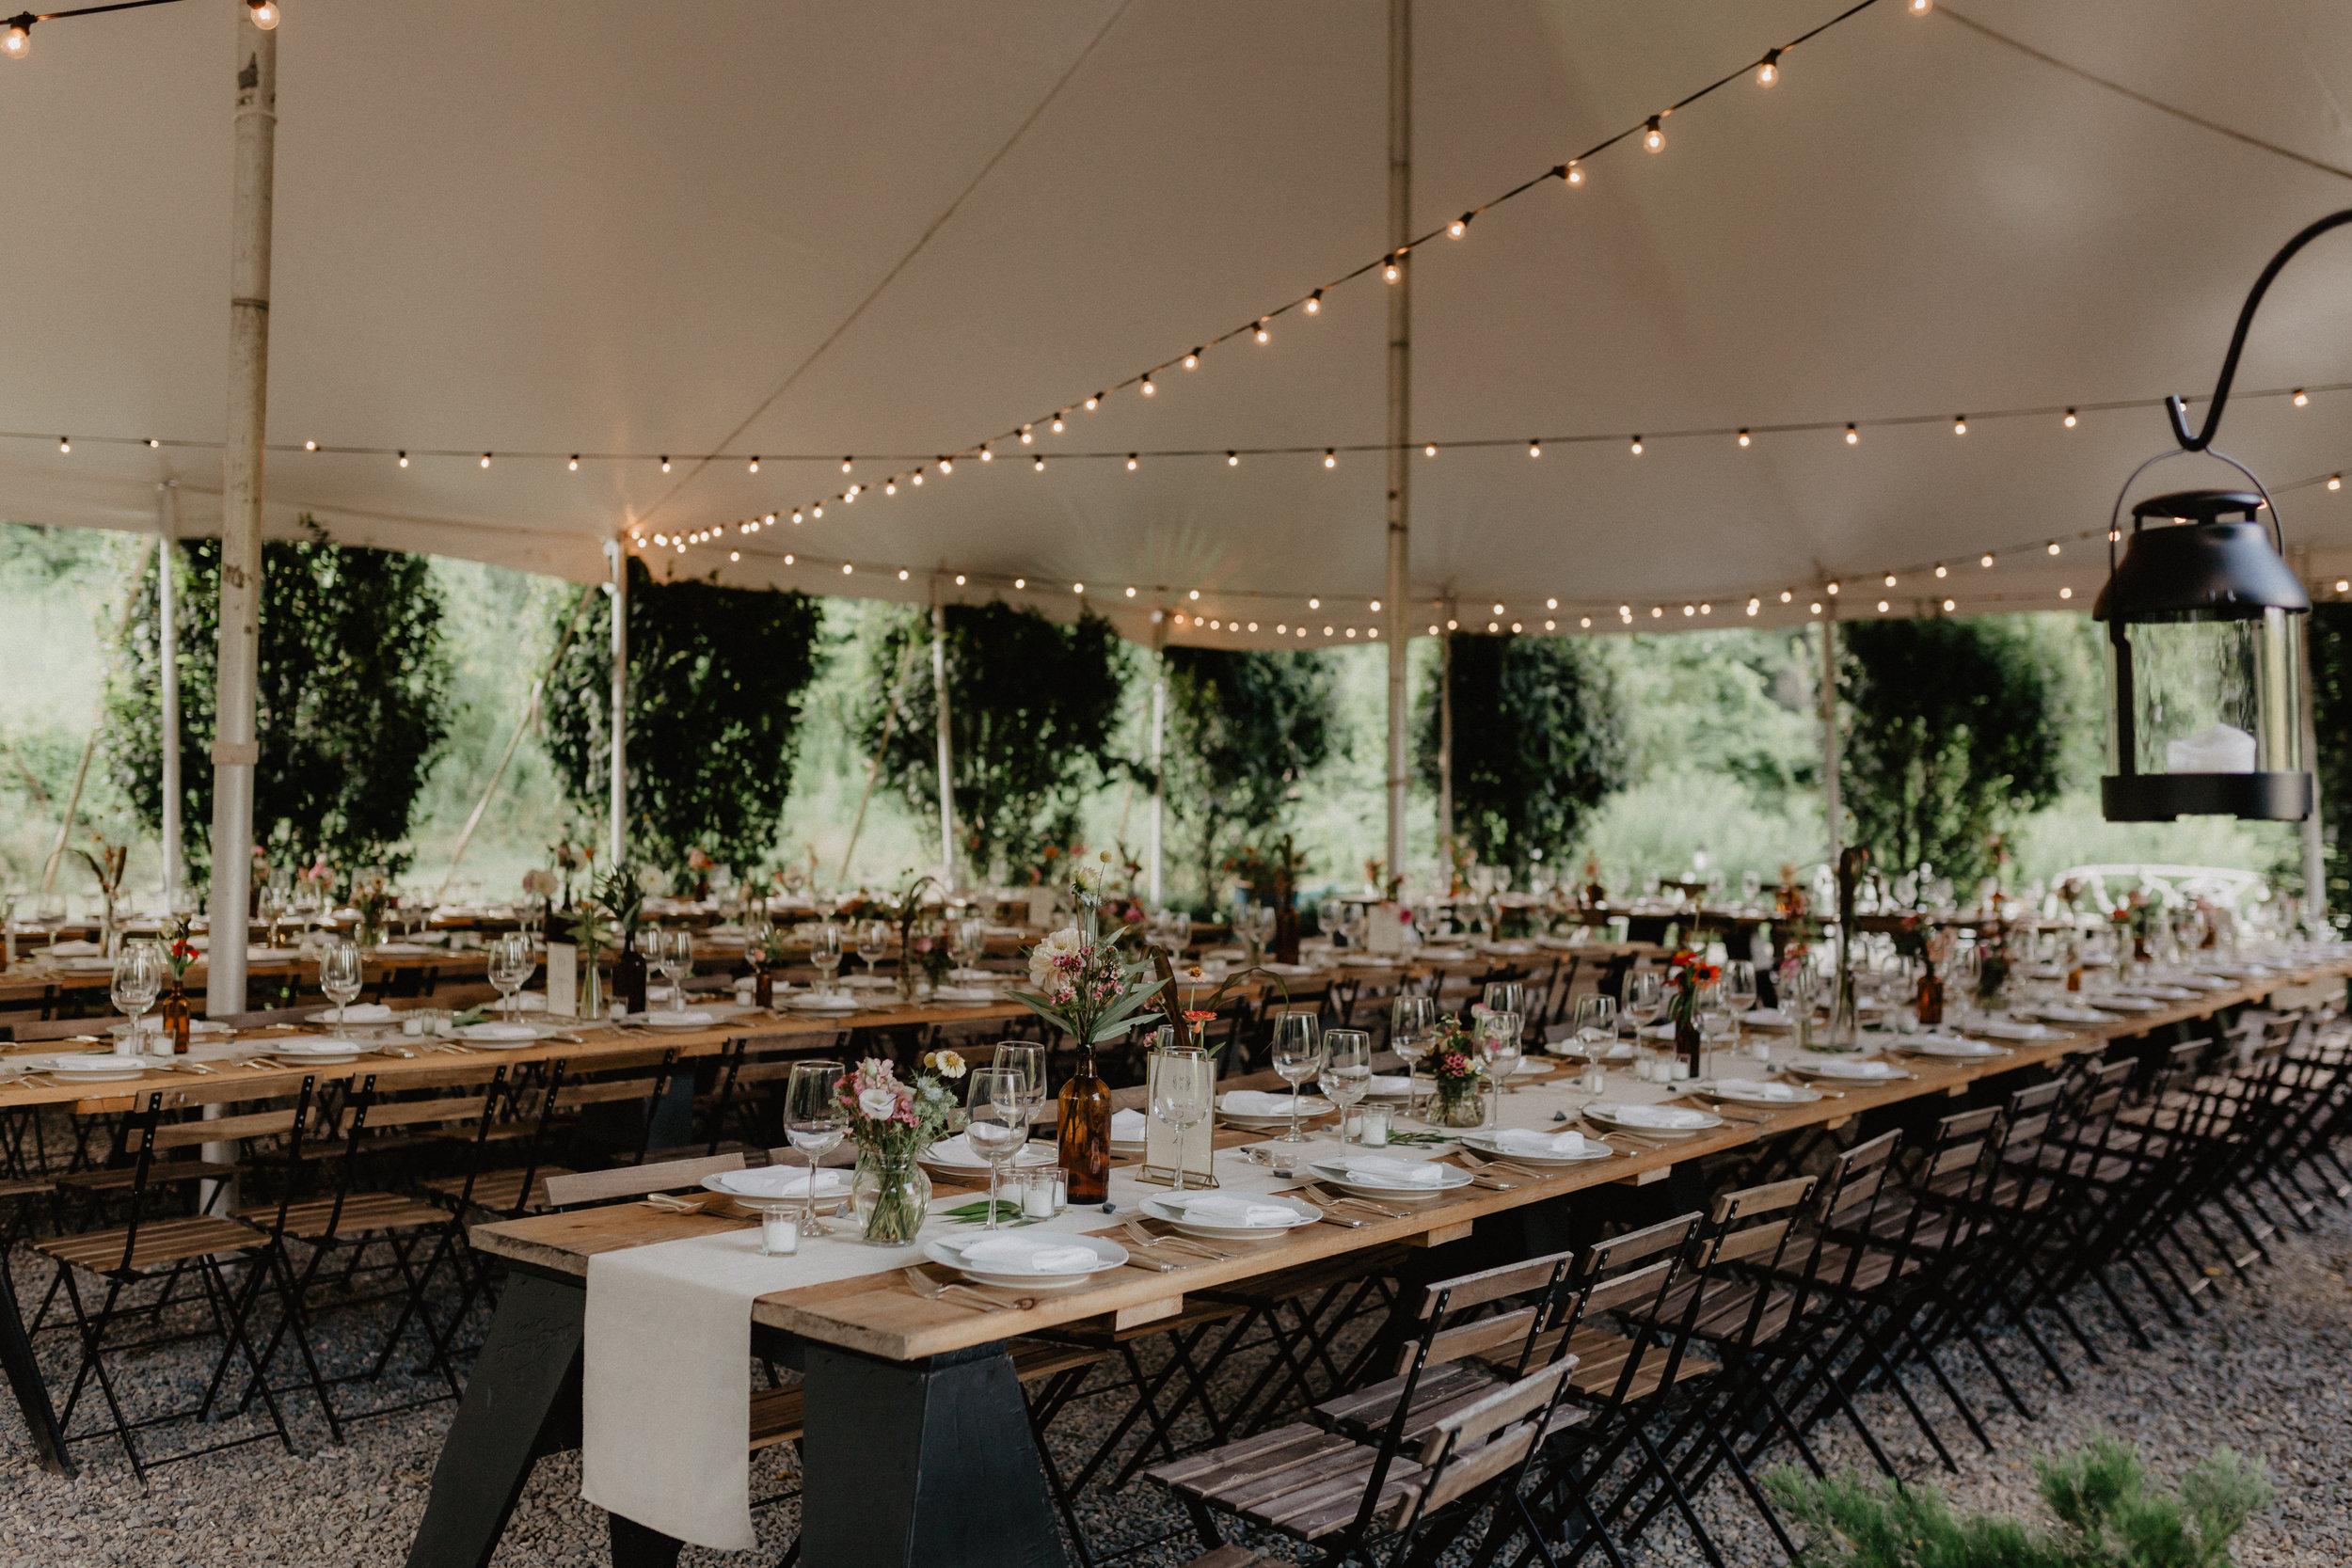 m-and-d-farm-wedding-79.jpg